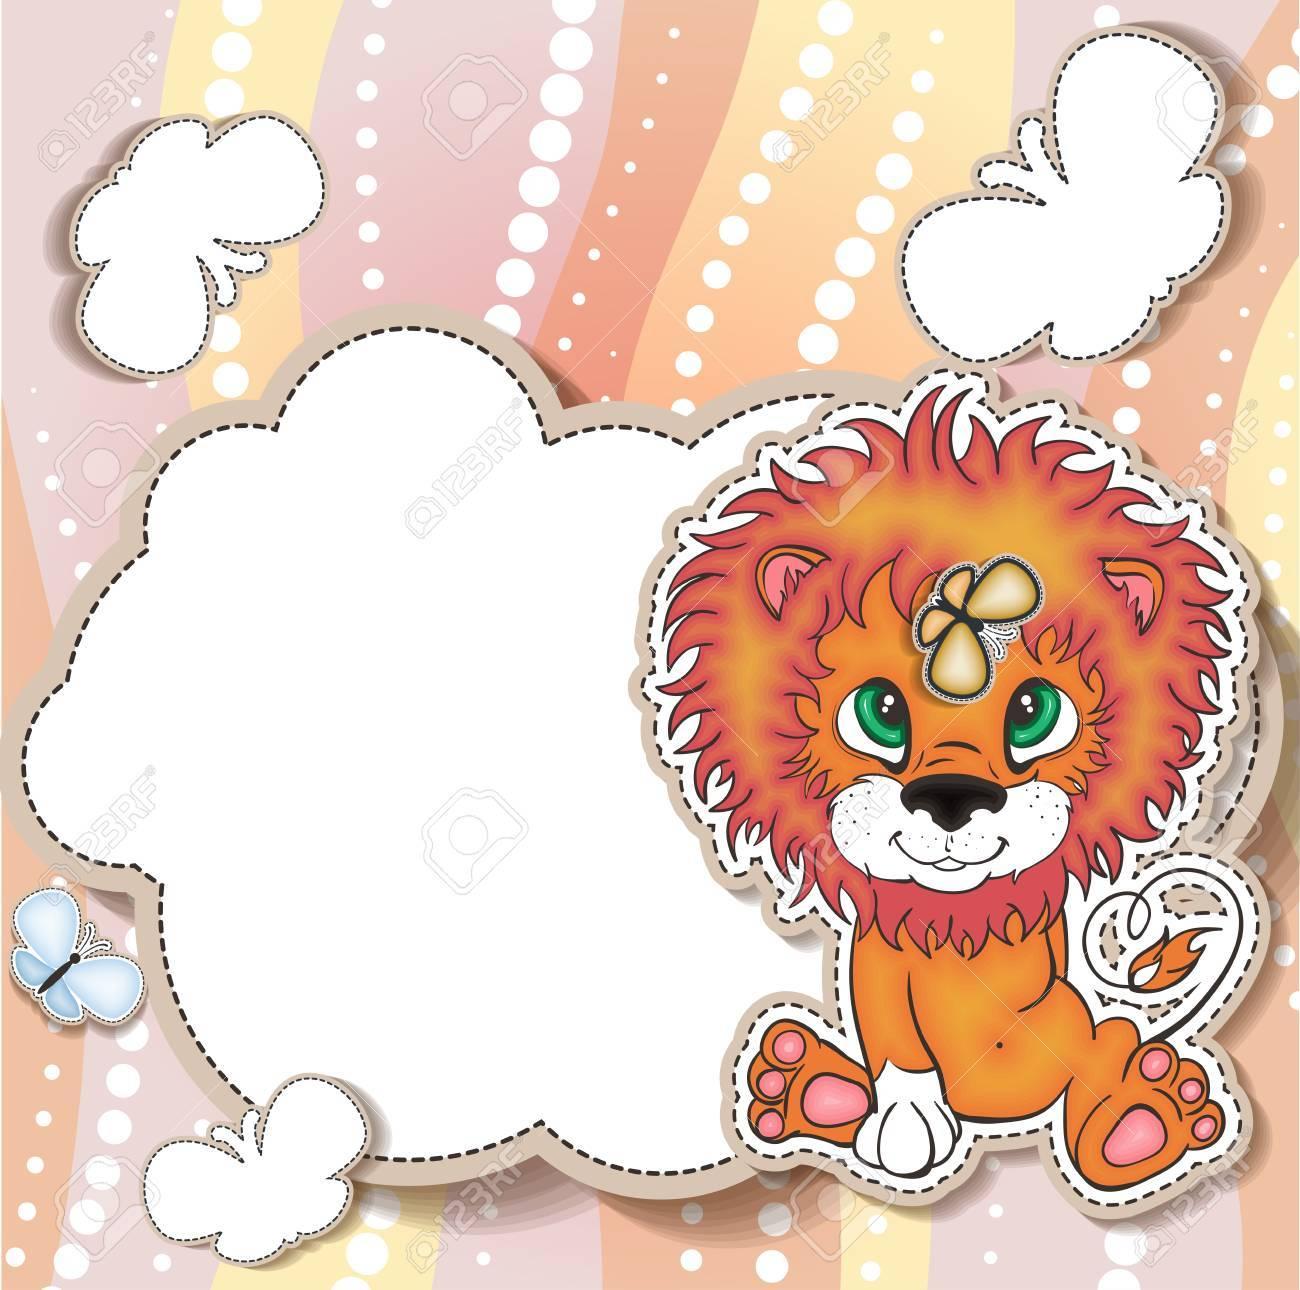 Cartoon style little lion design template Stock Vector - 16891129